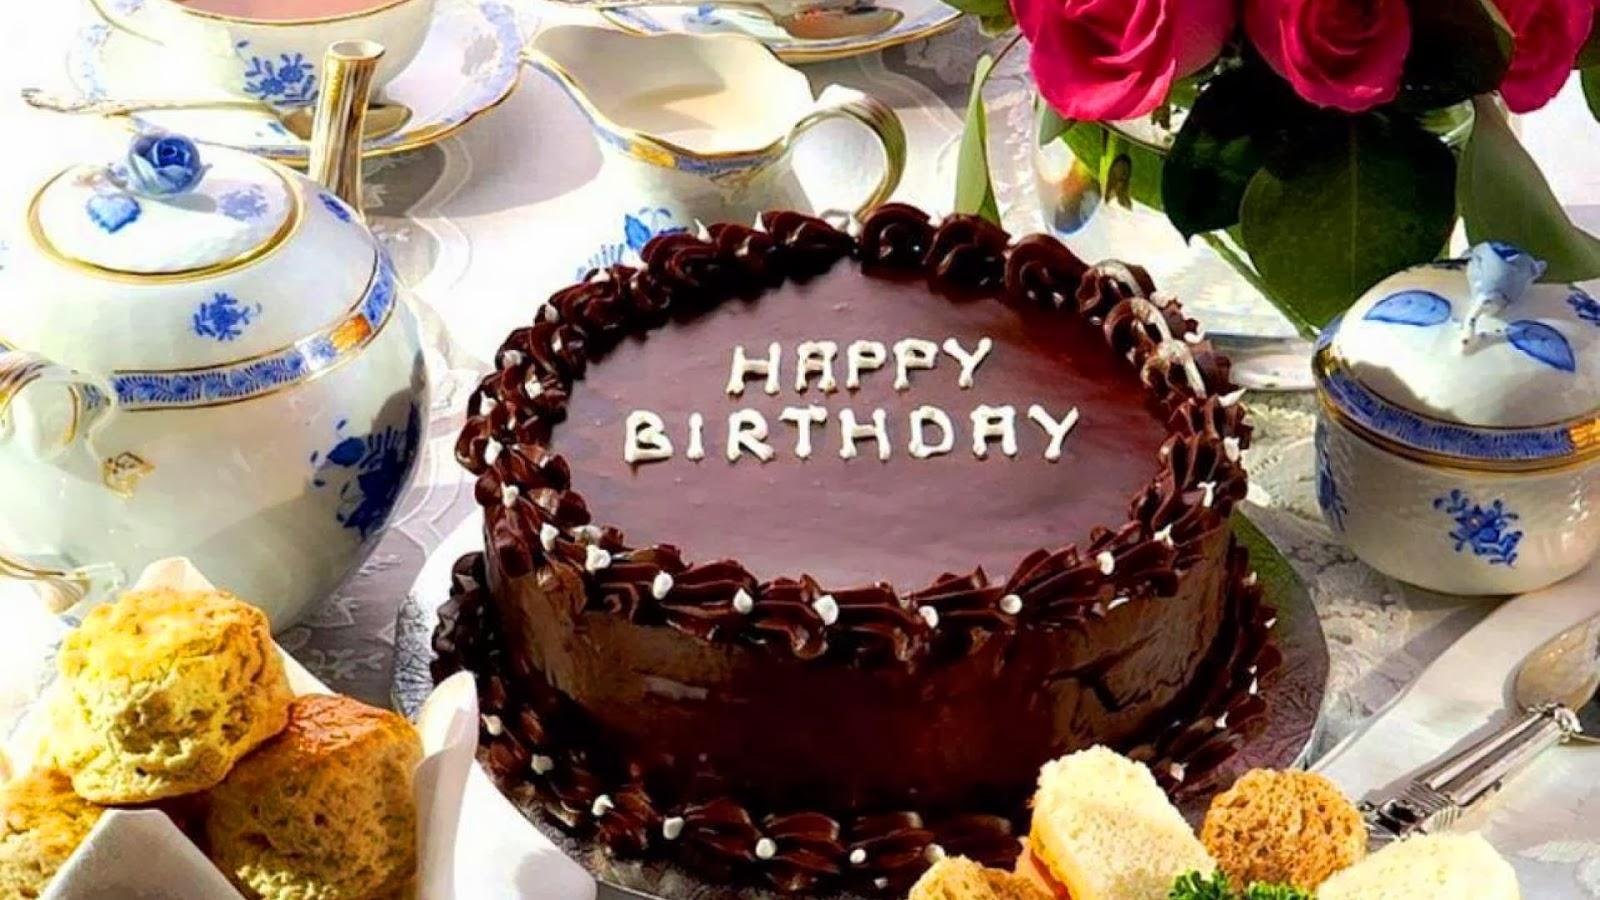 Beautiful Birthday Cake Pic Hd